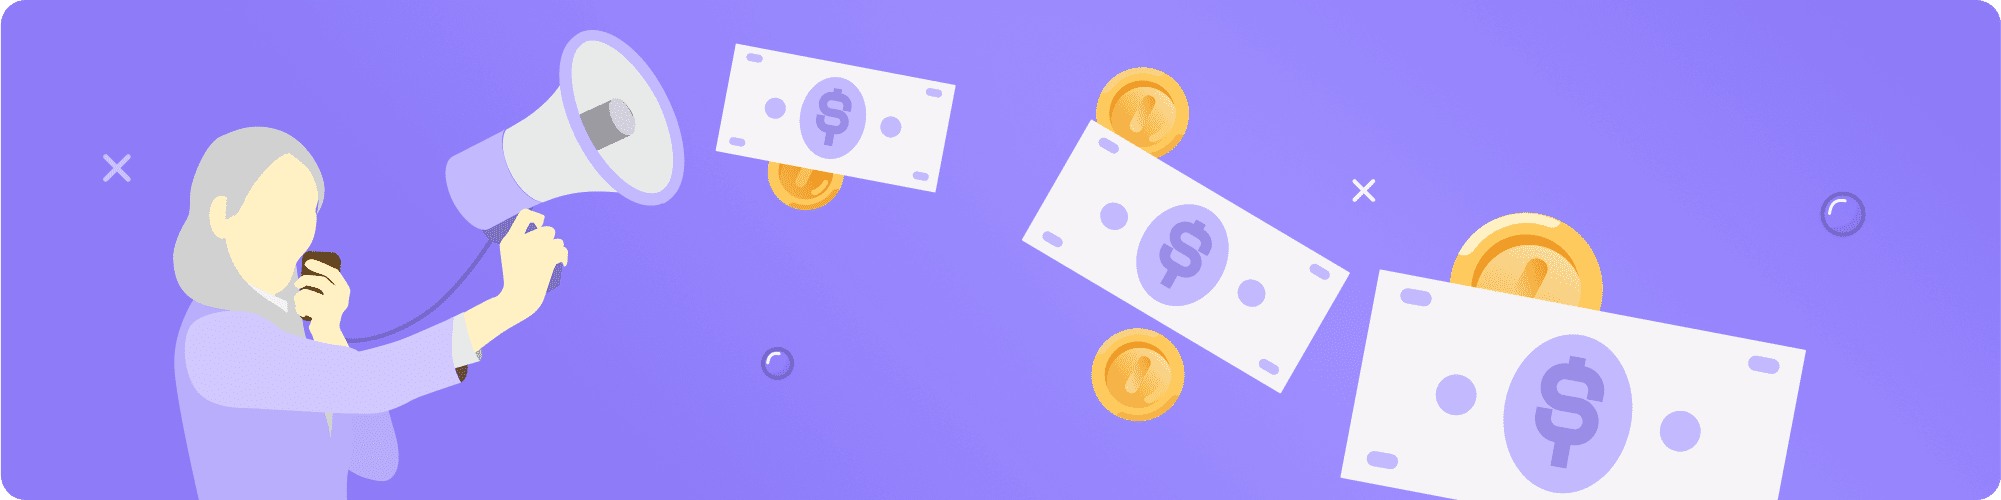 latest casino bonuses at SlotsBang.com